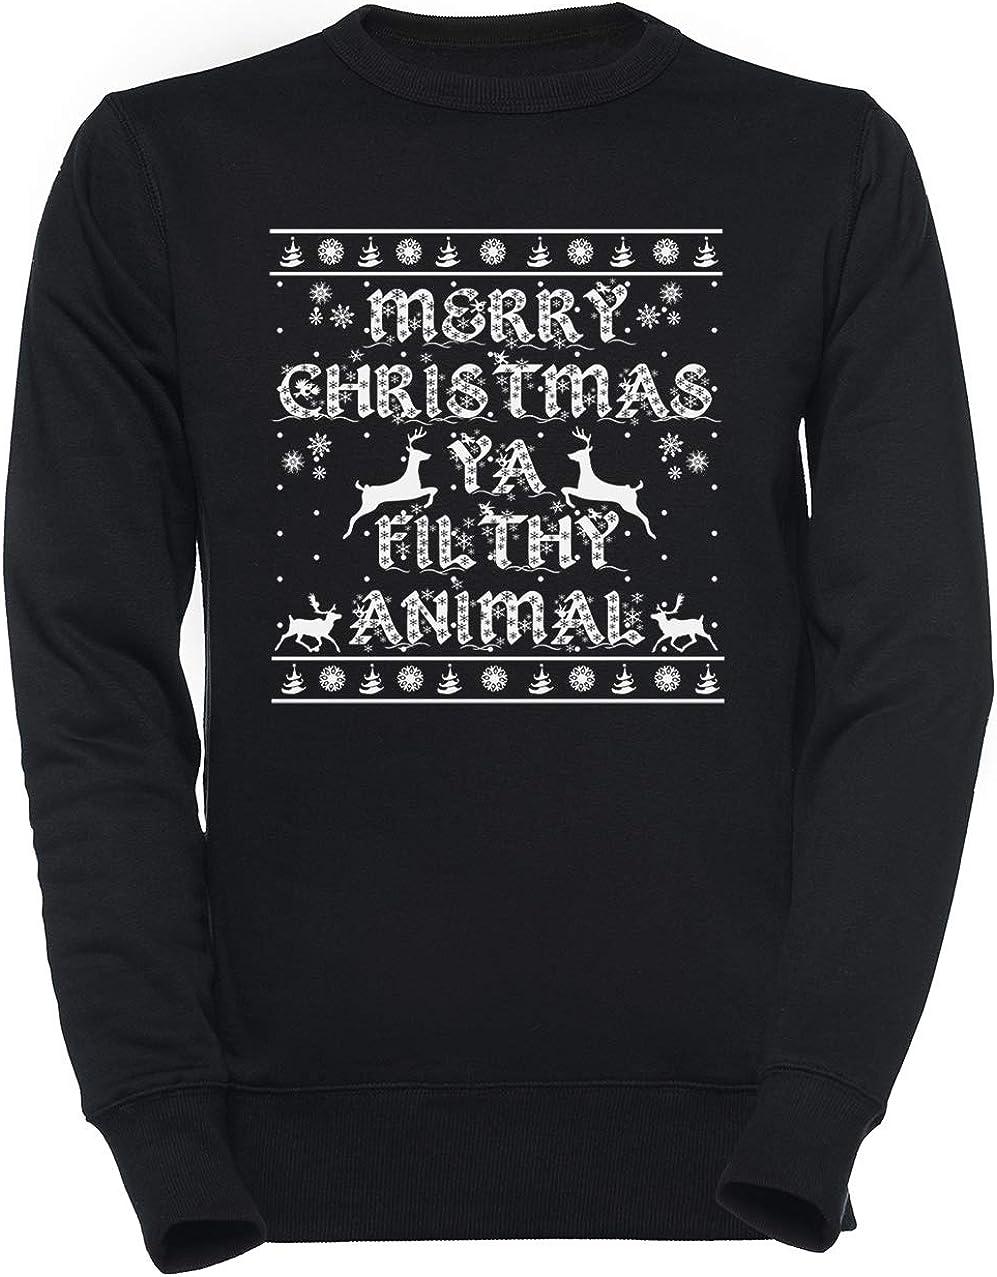 Merry Christmas Ya Filthy Animal Unisexo Negro Sudadera Hombre Mujer Unisex Black Jumper Men's Women's